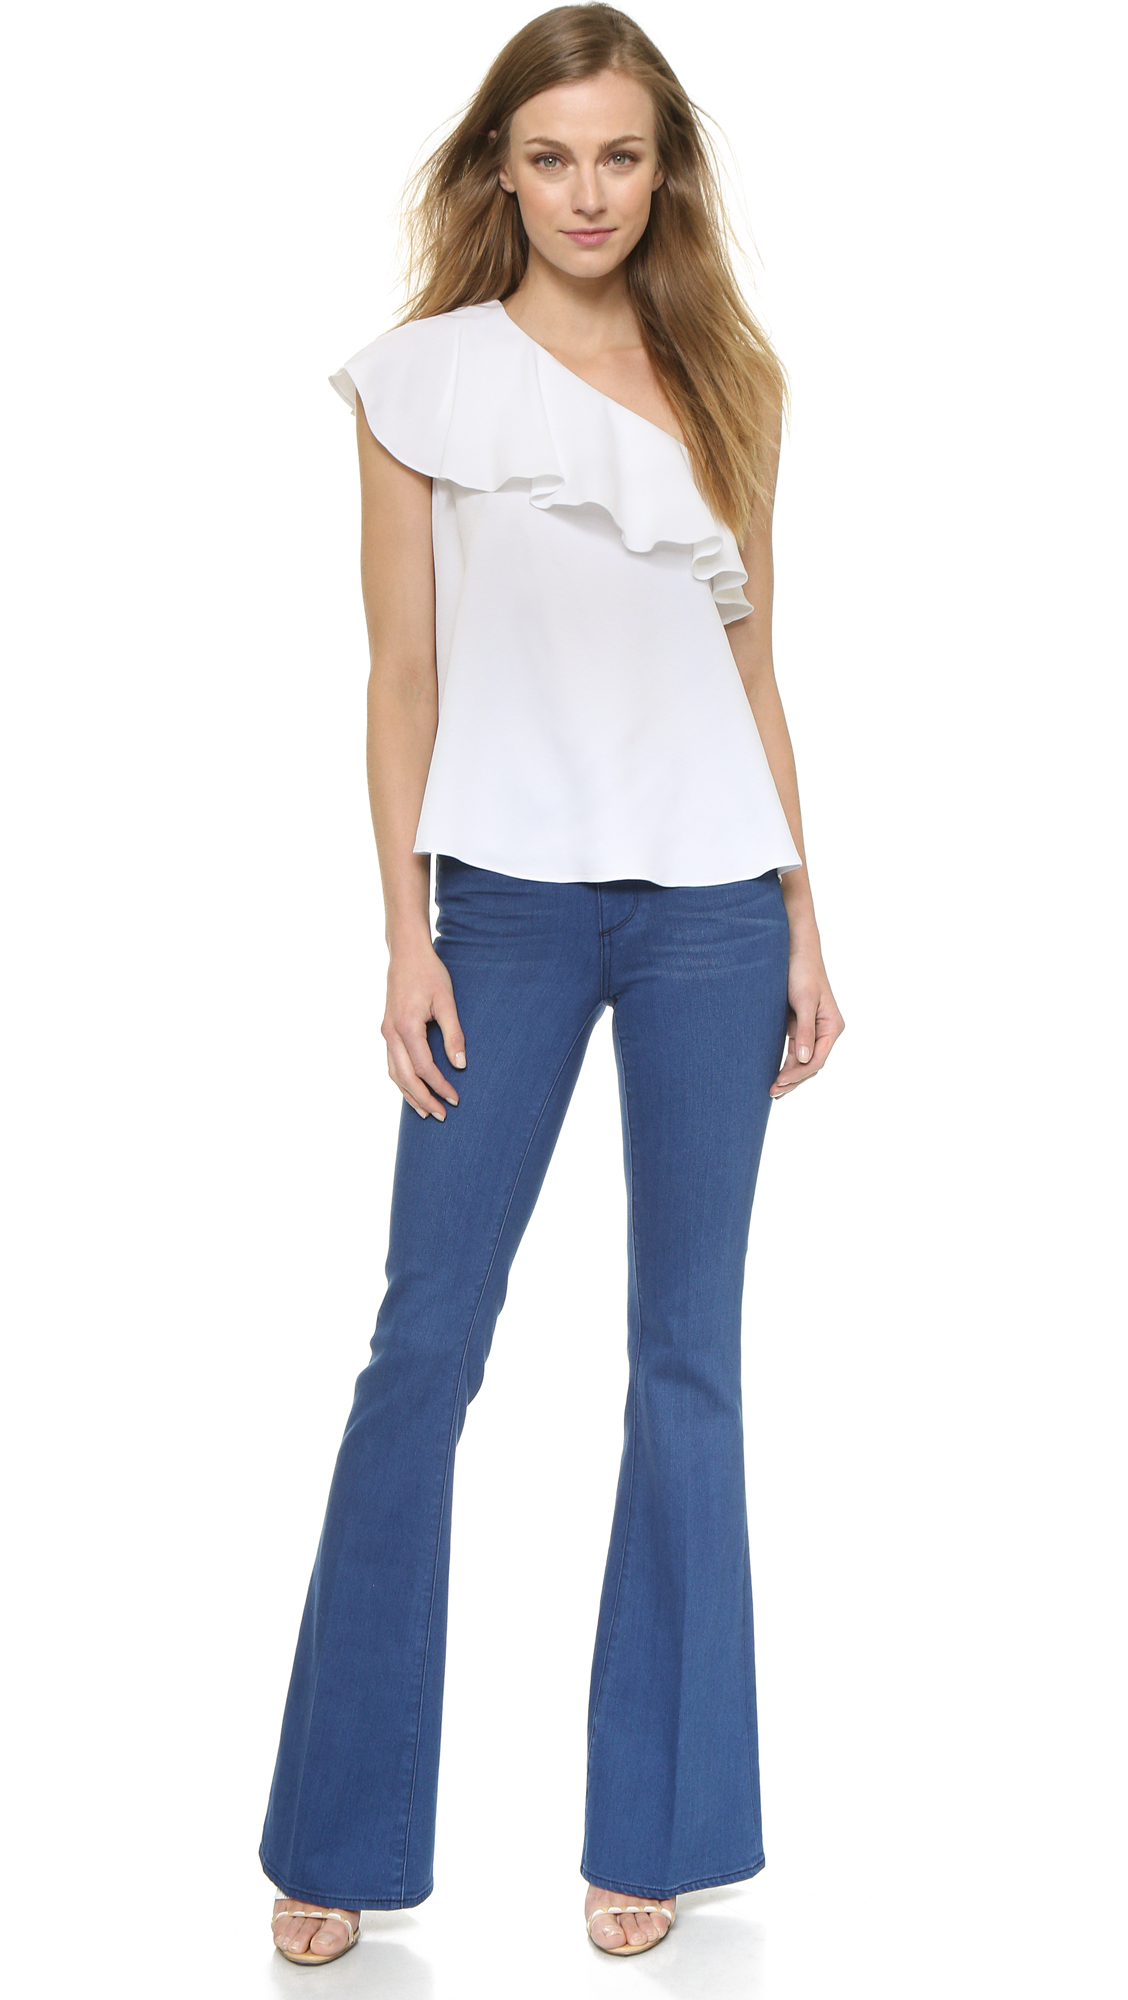 767e8ea1f1dbfd Rachel Zoe Leena One Shoulder Ruffle Top - Pure White in White - Lyst